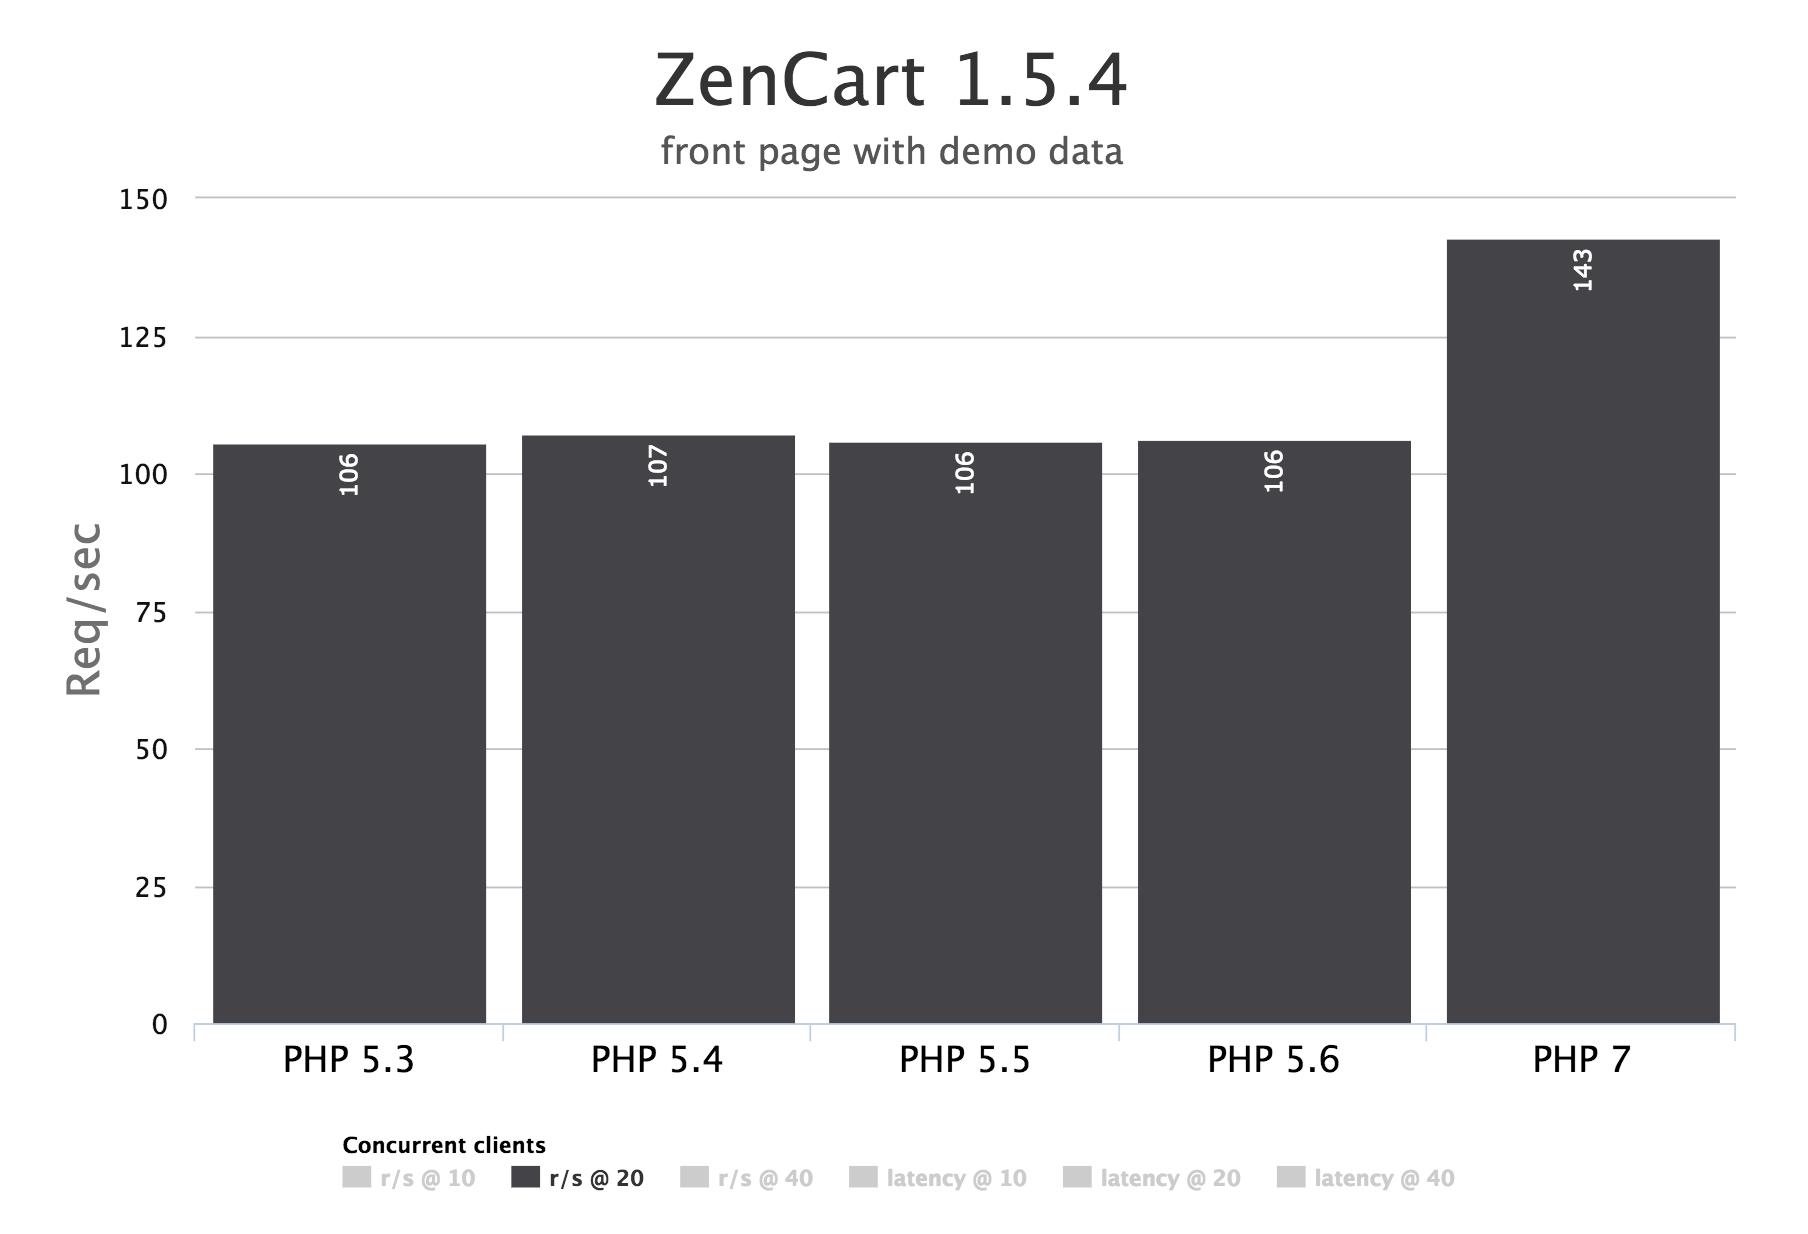 ZenCart 1.5.4